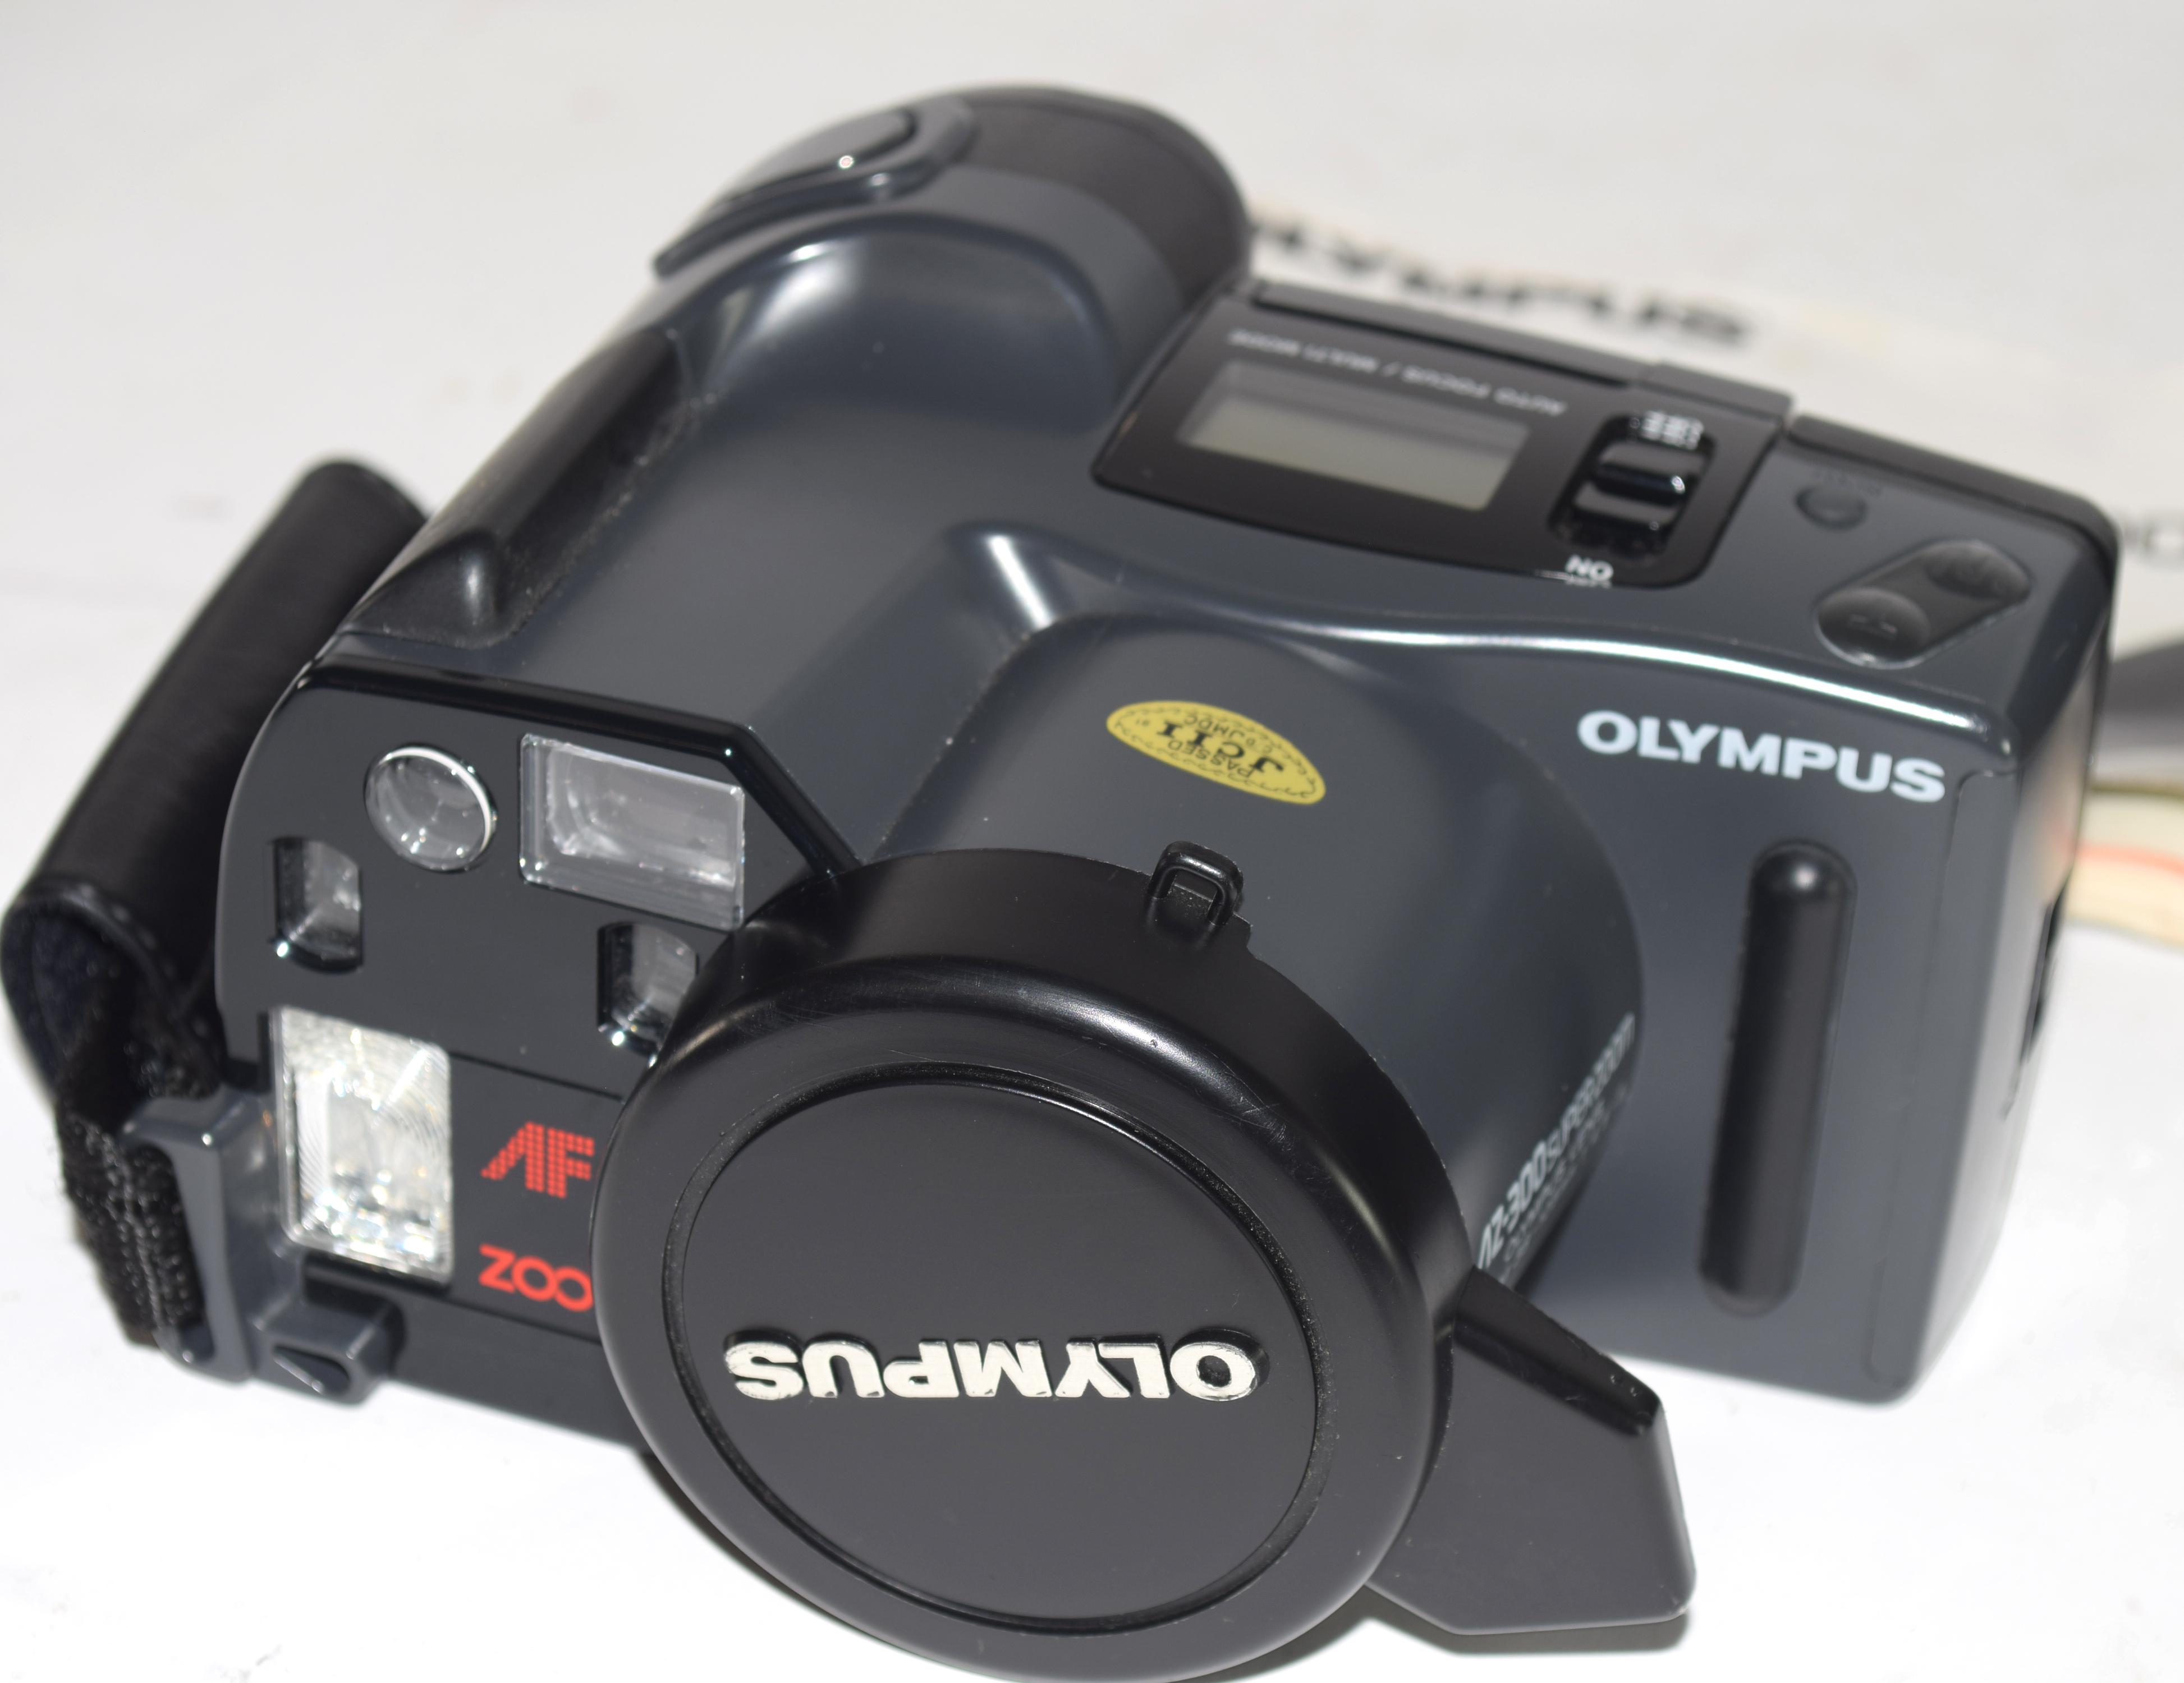 Binoculars in original black leather case and an Olympus camera (2) - Image 4 of 6